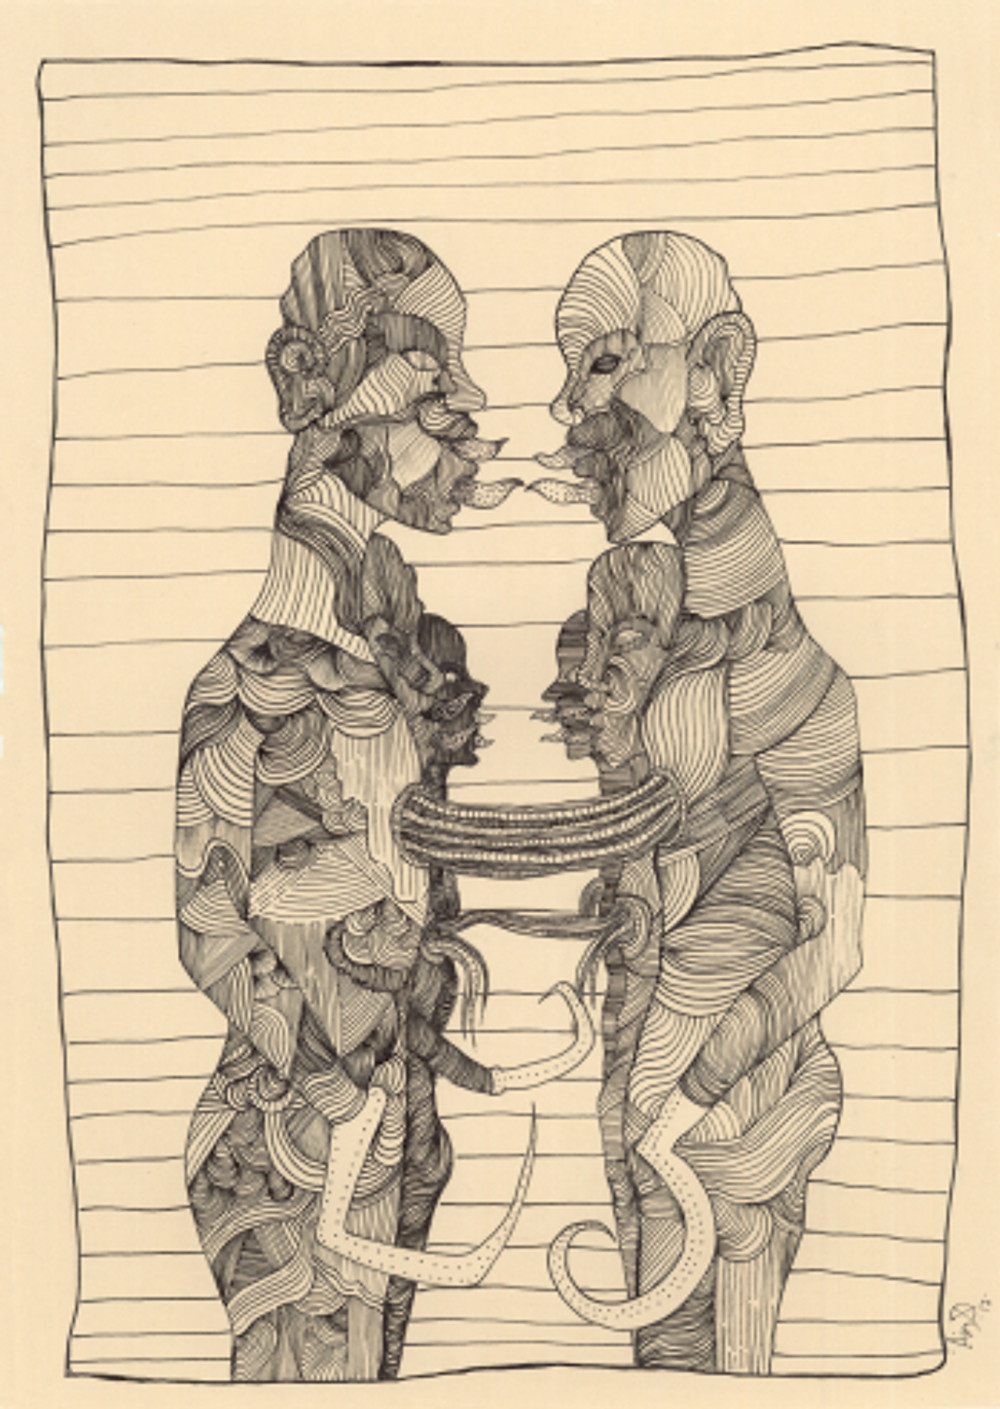 split no2, 42x29.7 cm, inking pen on paper, 2017